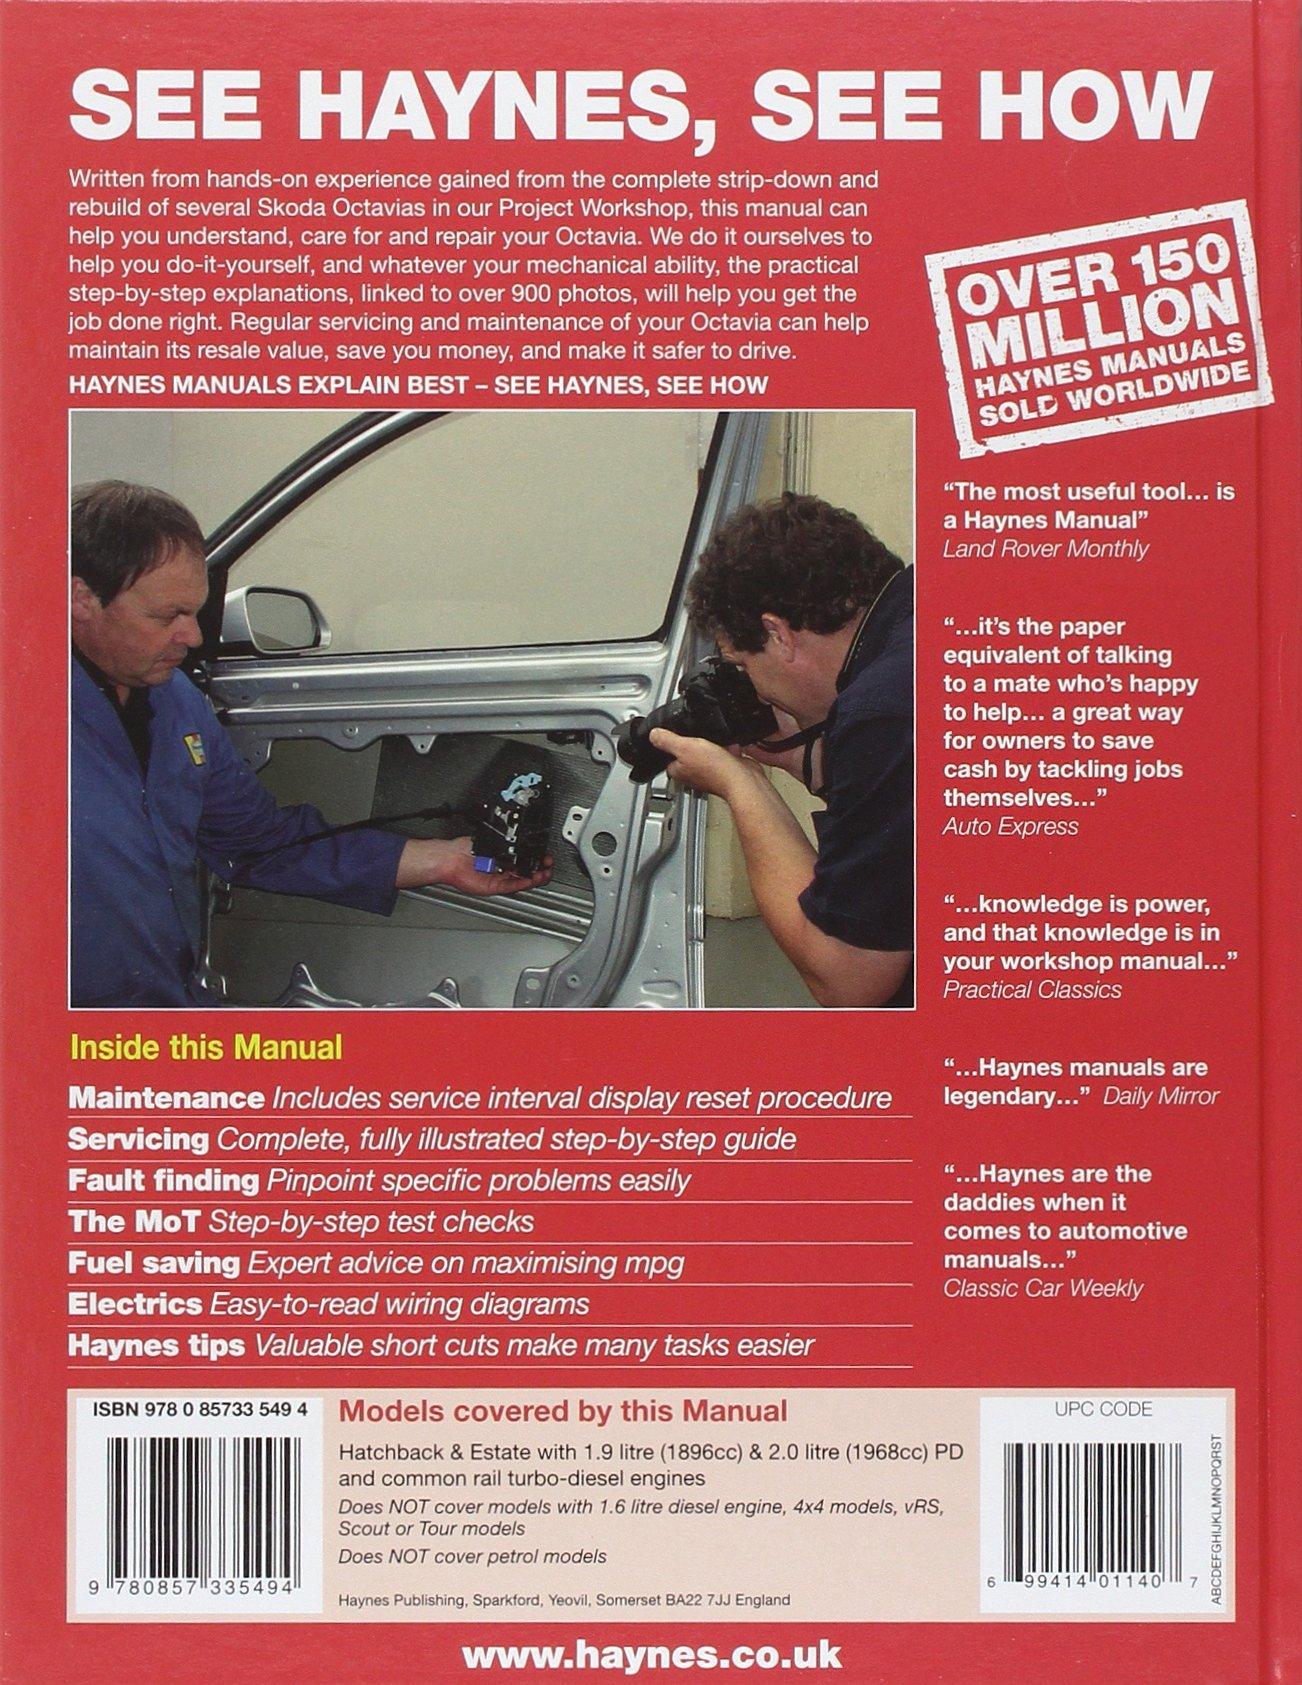 Skoda octavia diesel service repair manual 2004 2012 haynes skoda octavia diesel service repair manual 2004 2012 haynes service and repair manuals chris randall 9780857335494 amazon books fandeluxe Images